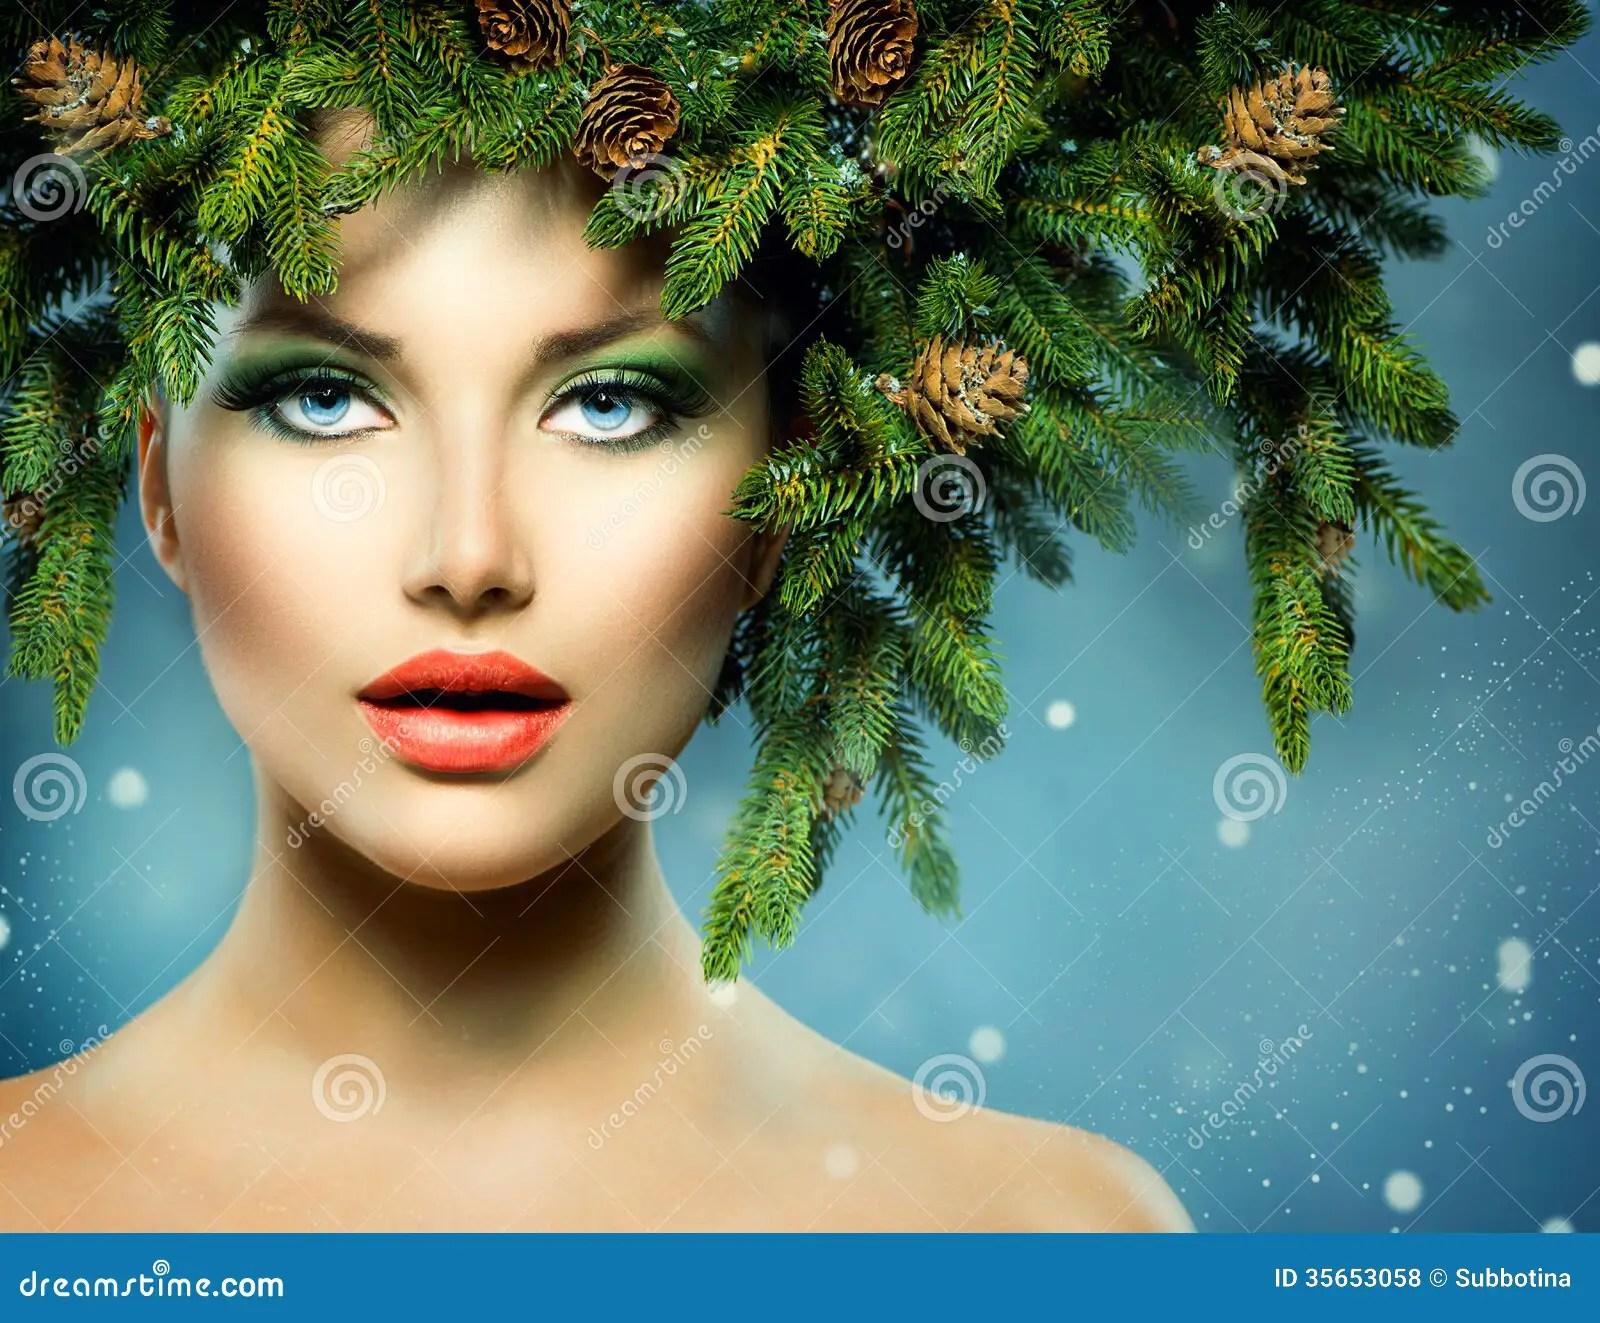 Christmas Woman Royalty Free Stock Photos Image 35653058